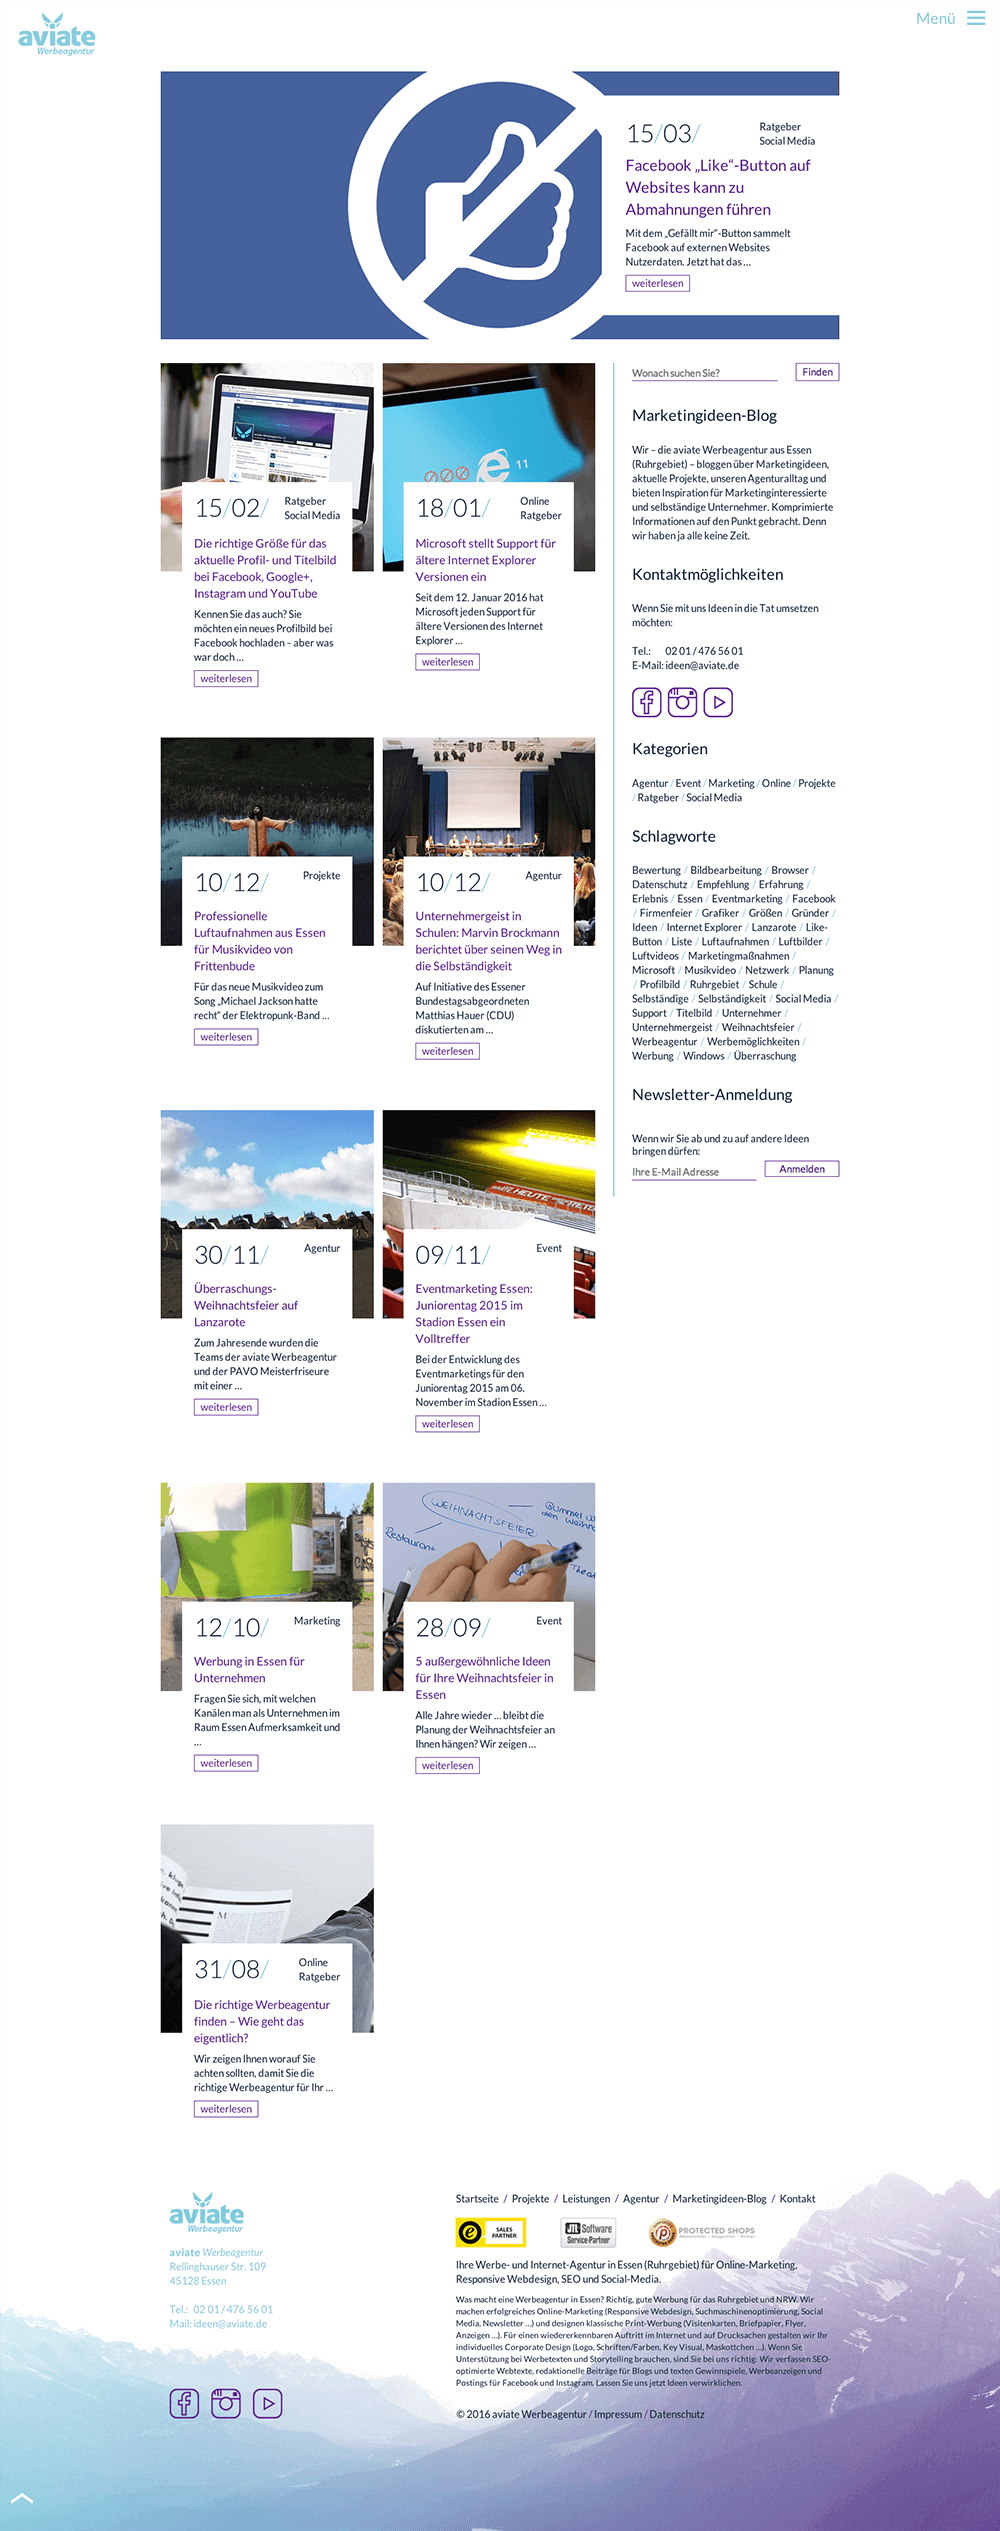 aviate Werbeagentur Blog